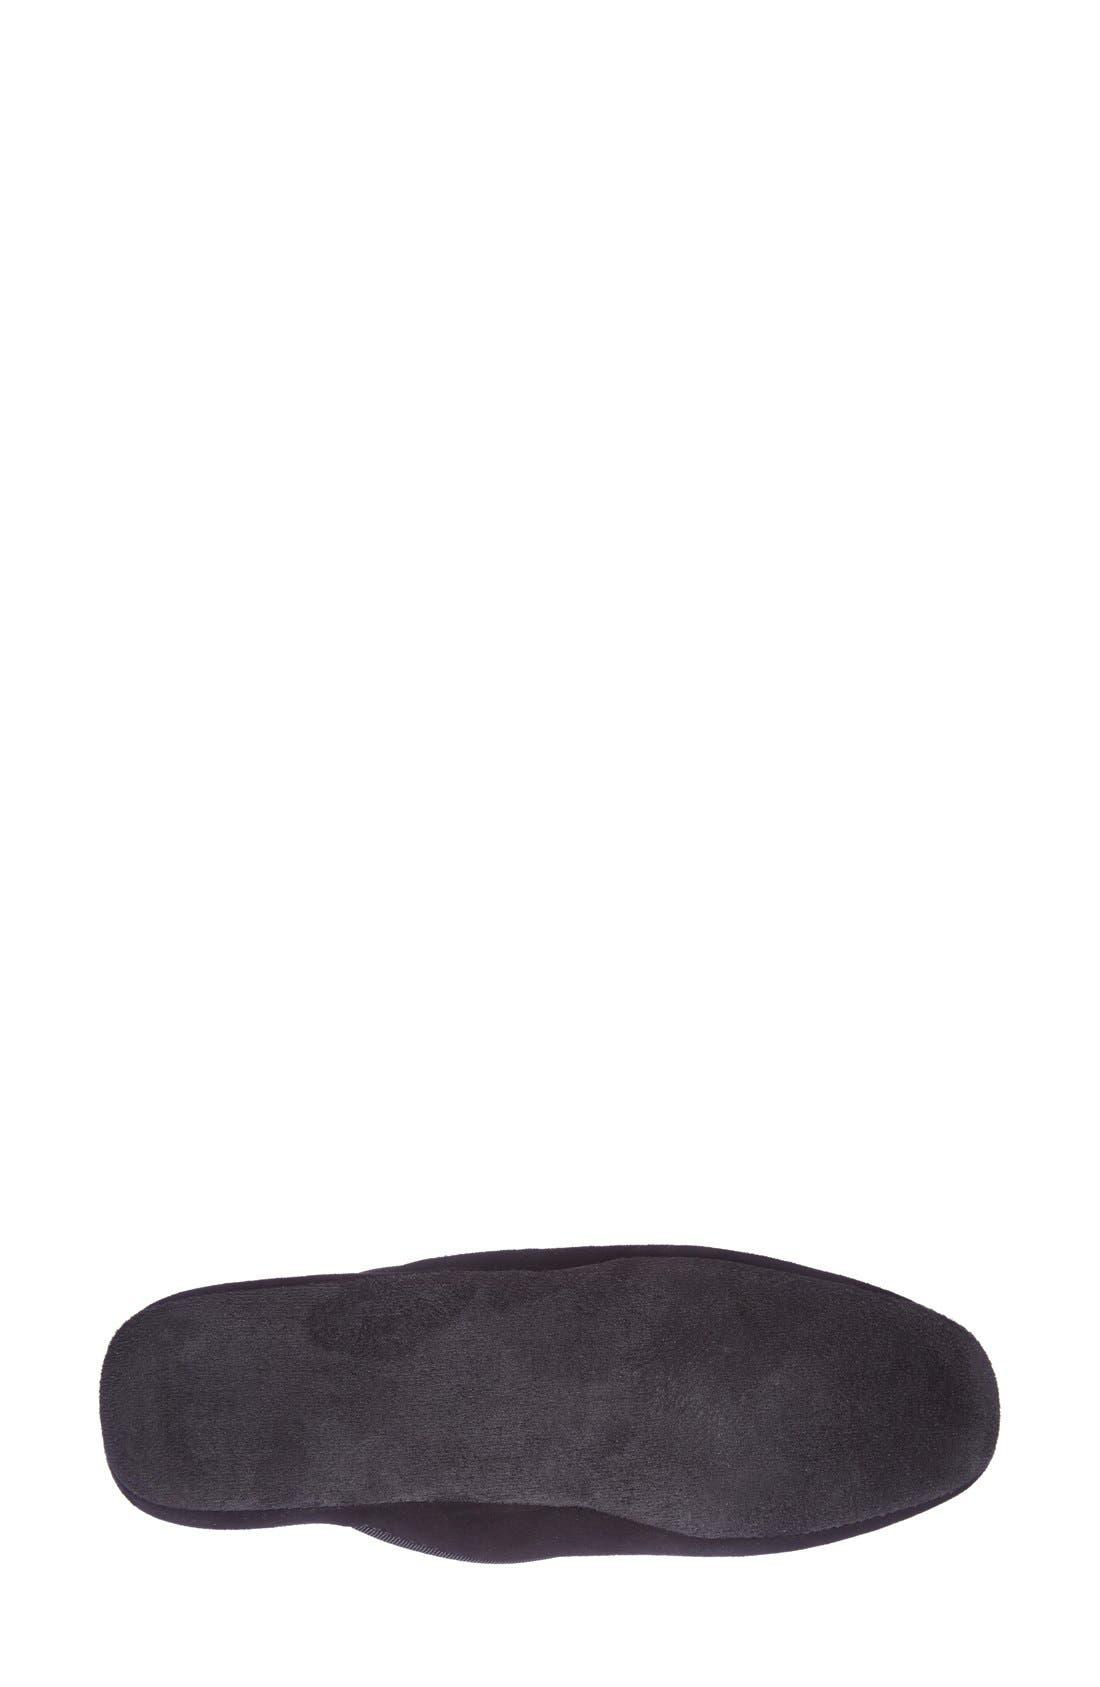 'Milano' Bit Embroidered Slipper,                             Alternate thumbnail 4, color,                             BLACK